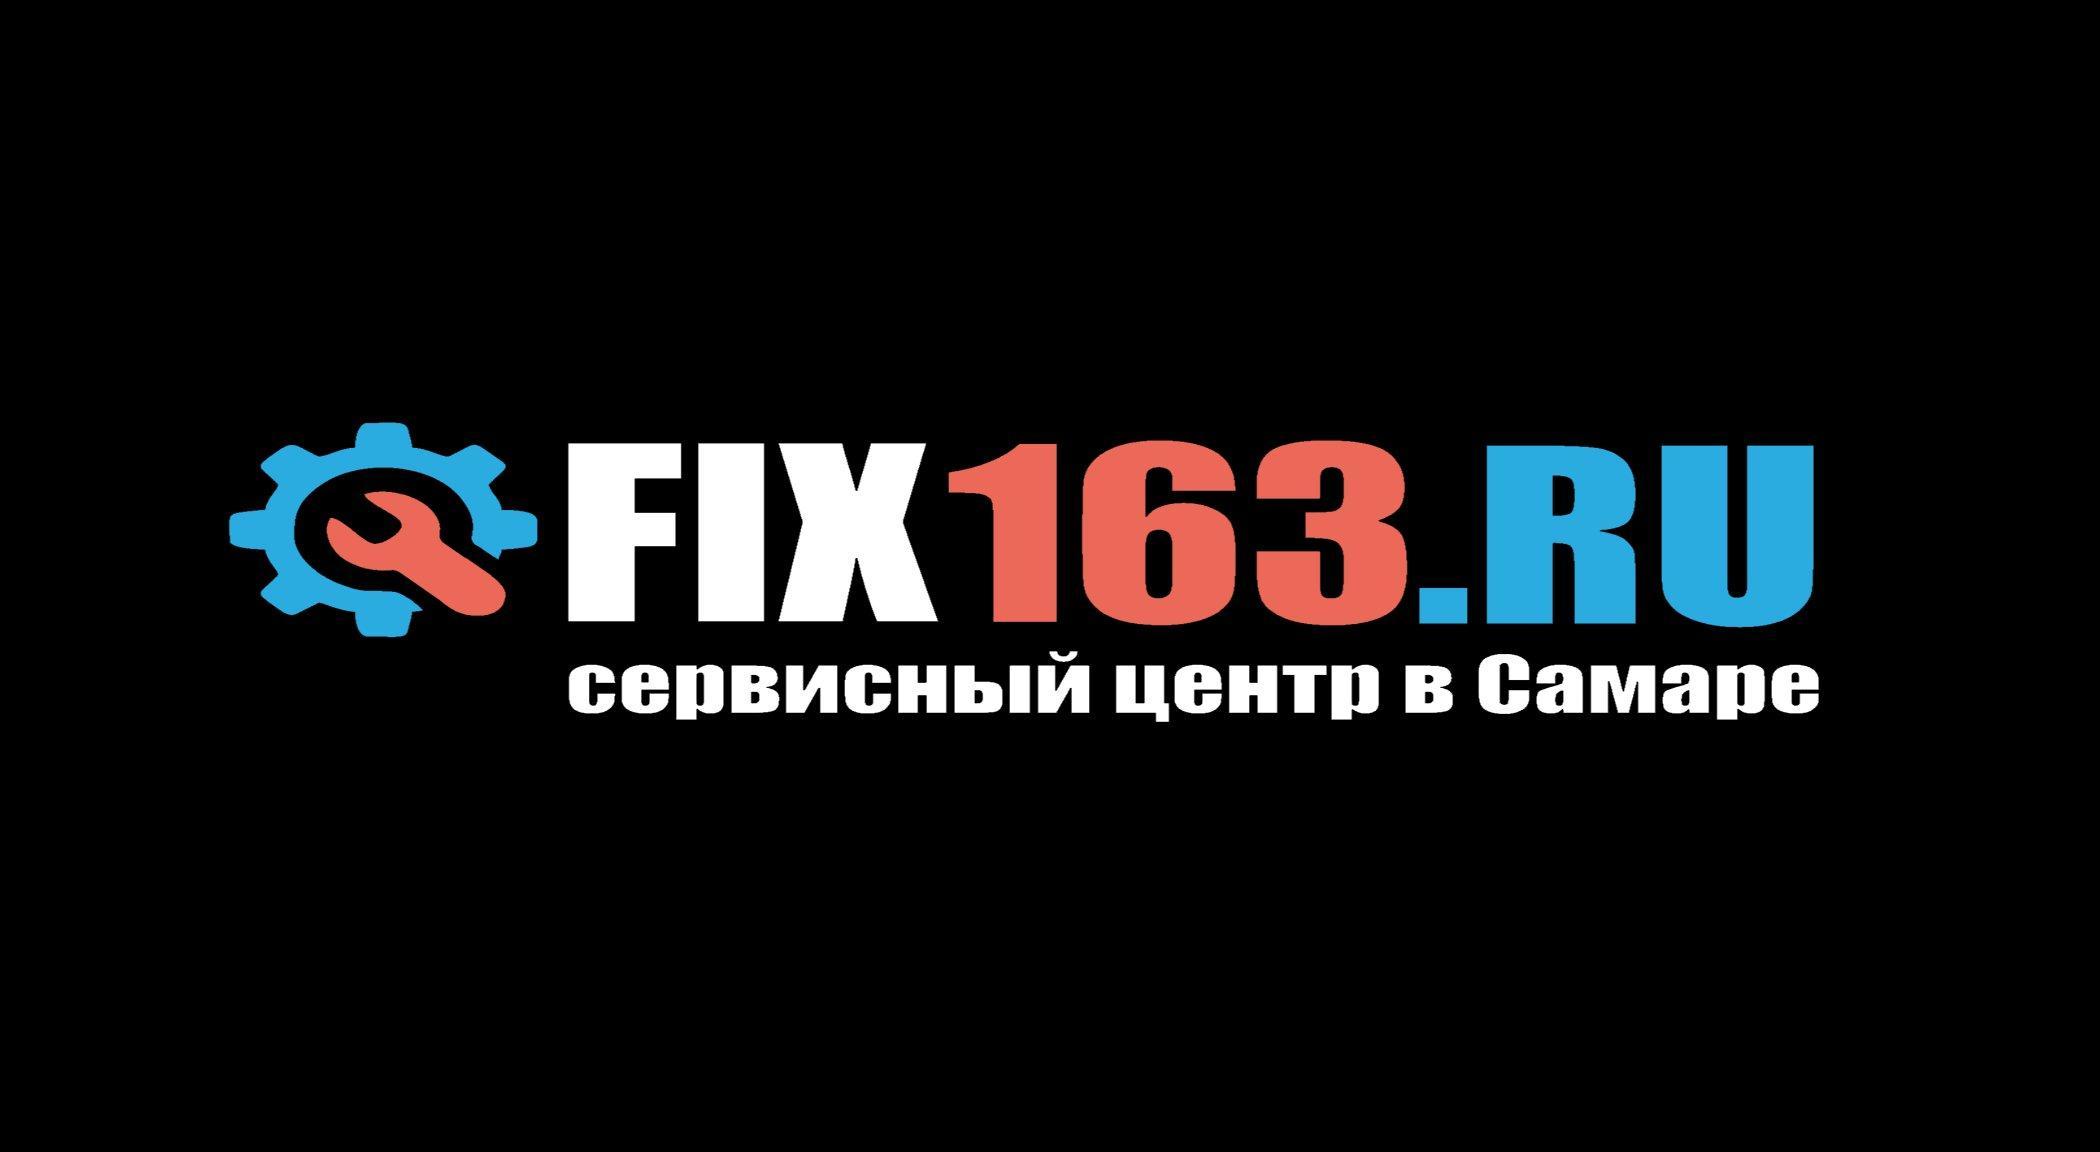 фотография Сервисного центра Fix163 на улице 22 Партсъезда